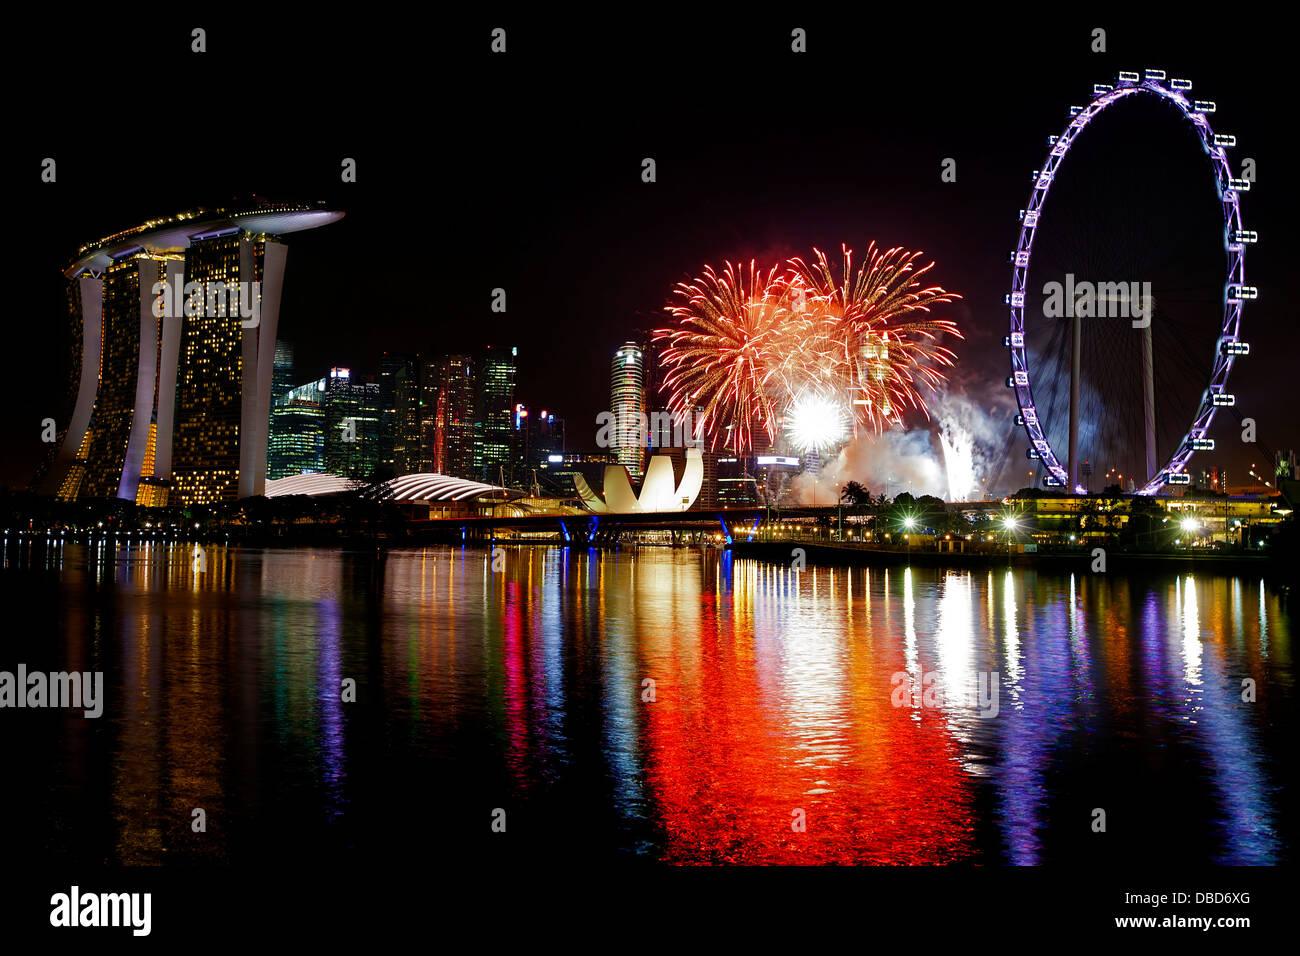 Singapur Feuerwerk Stockbild